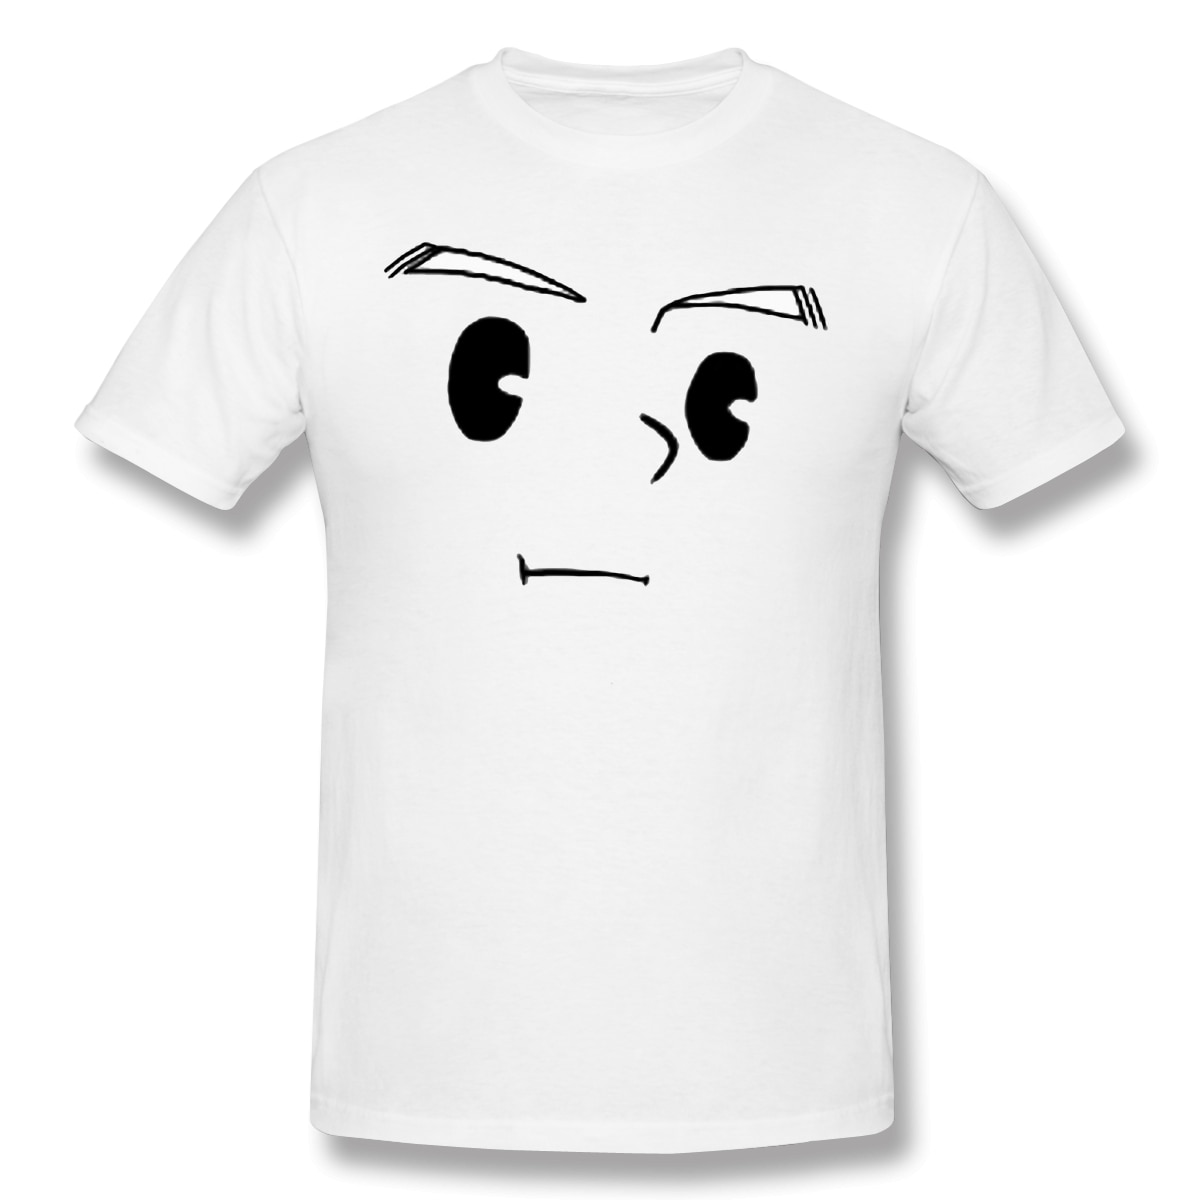 Camiseta Mirio Togata diseño divertido my hero ropa de calle estampada Homme Top